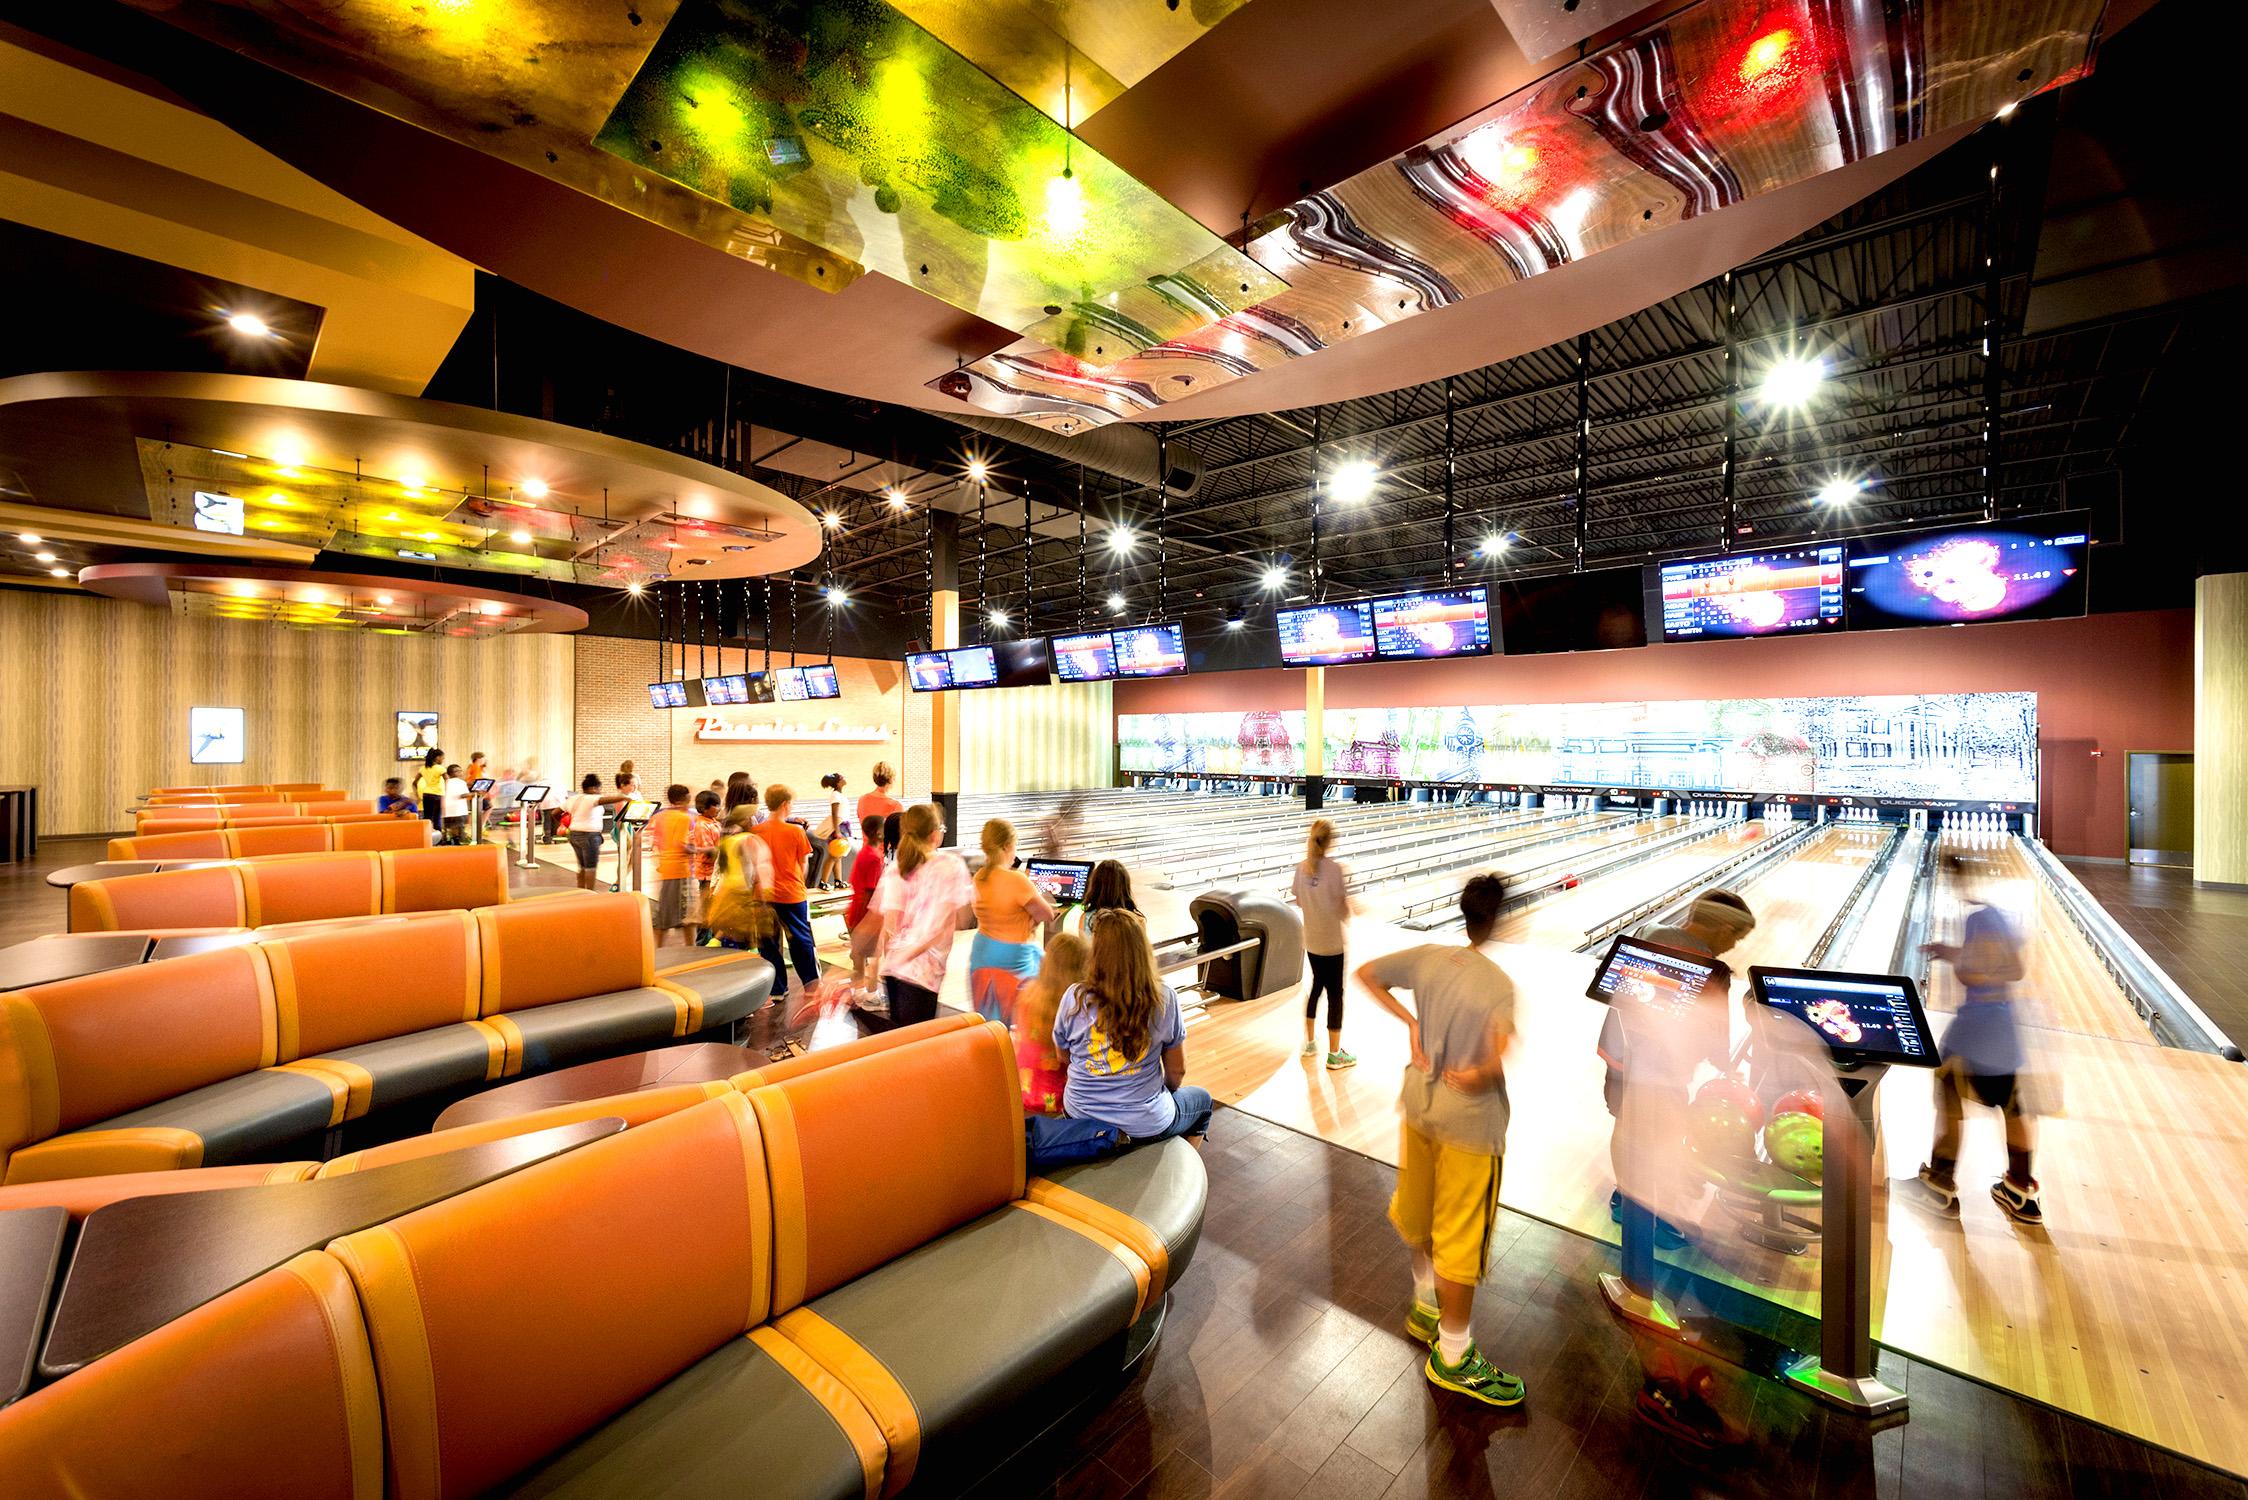 Casablanca Bowling